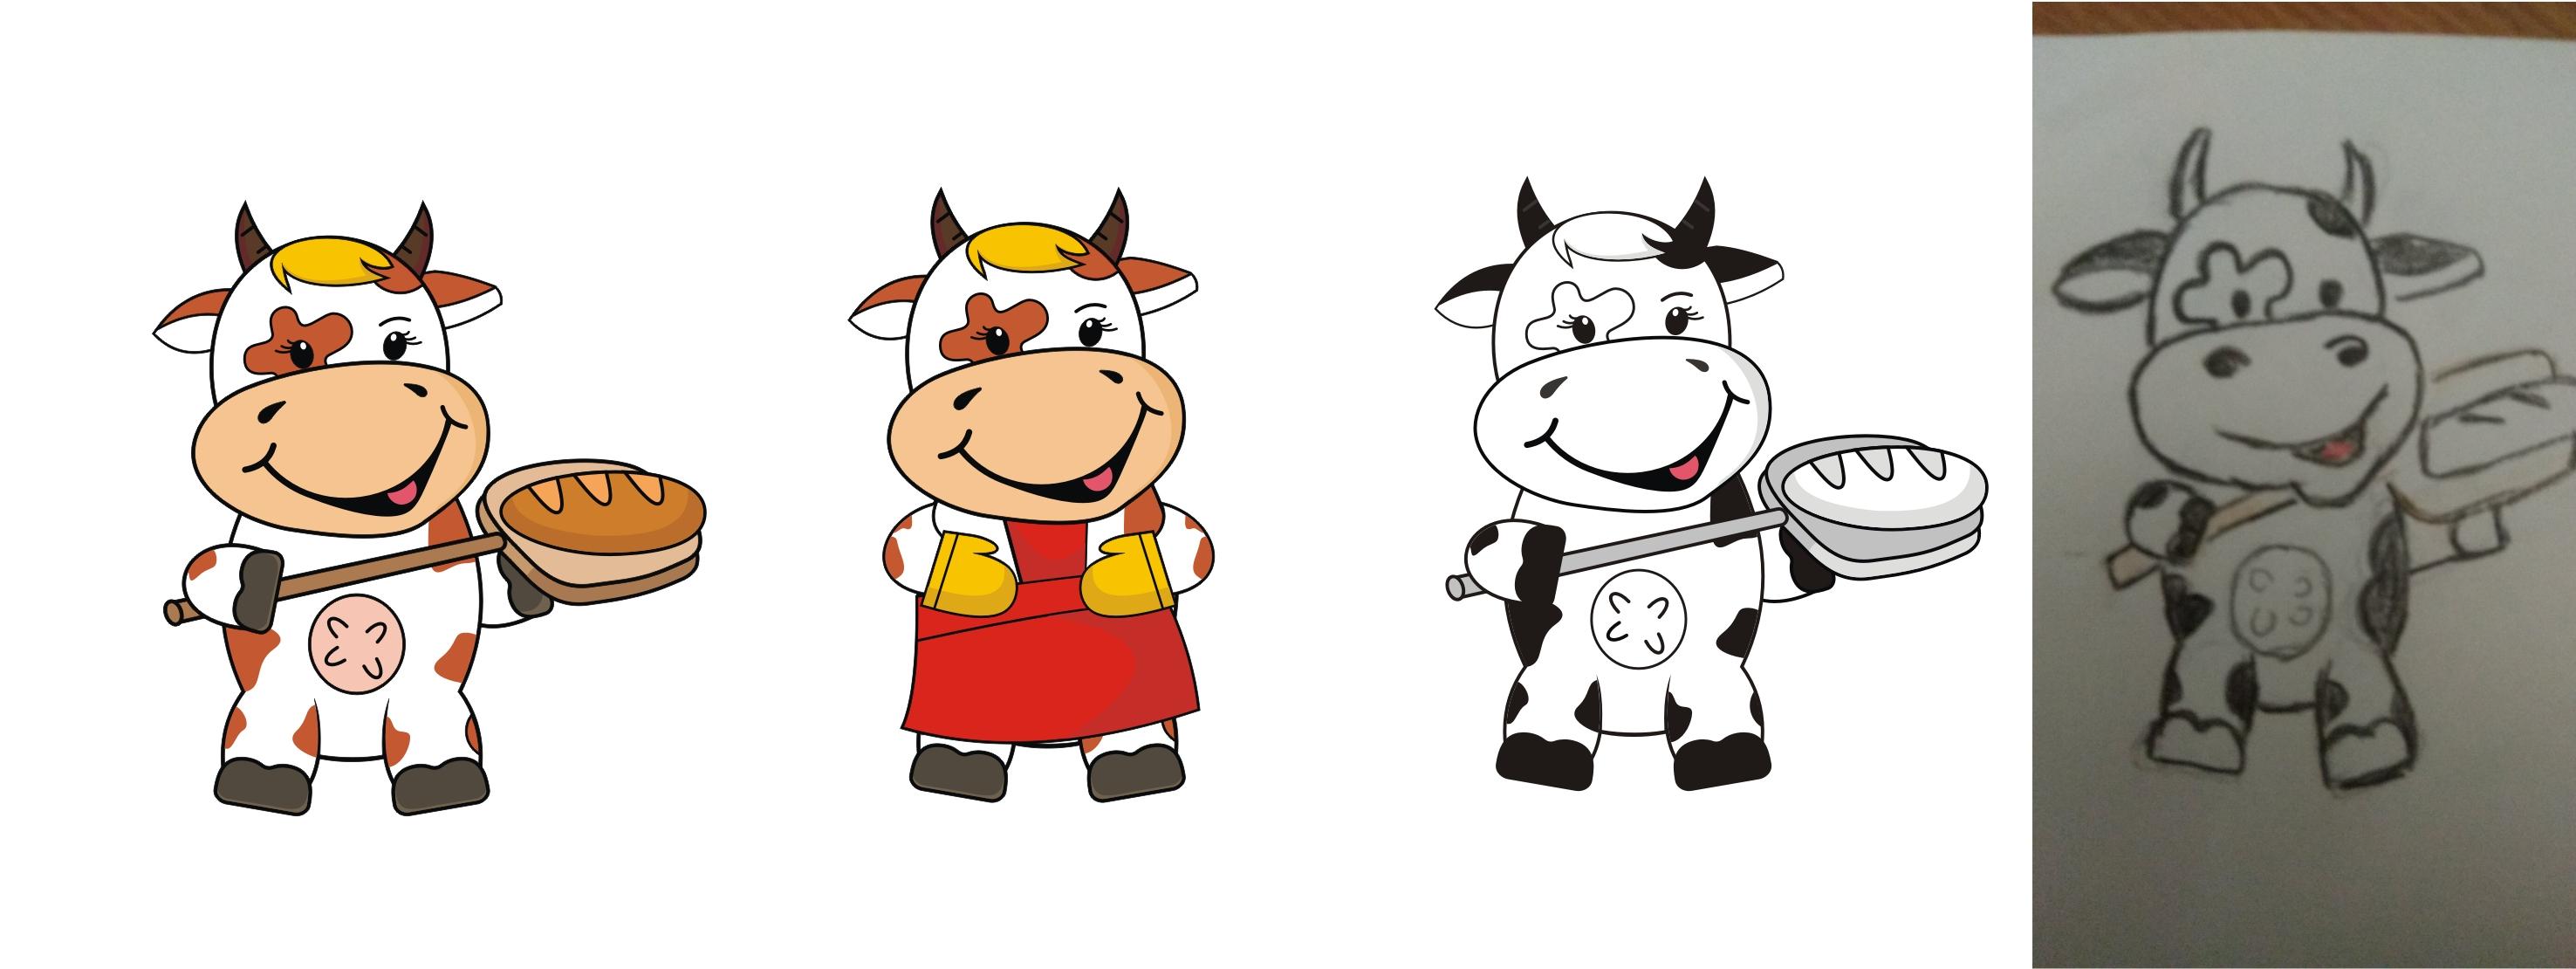 Логотип для Бургерной с Пекарней фото f_2275e1a327209449.jpg